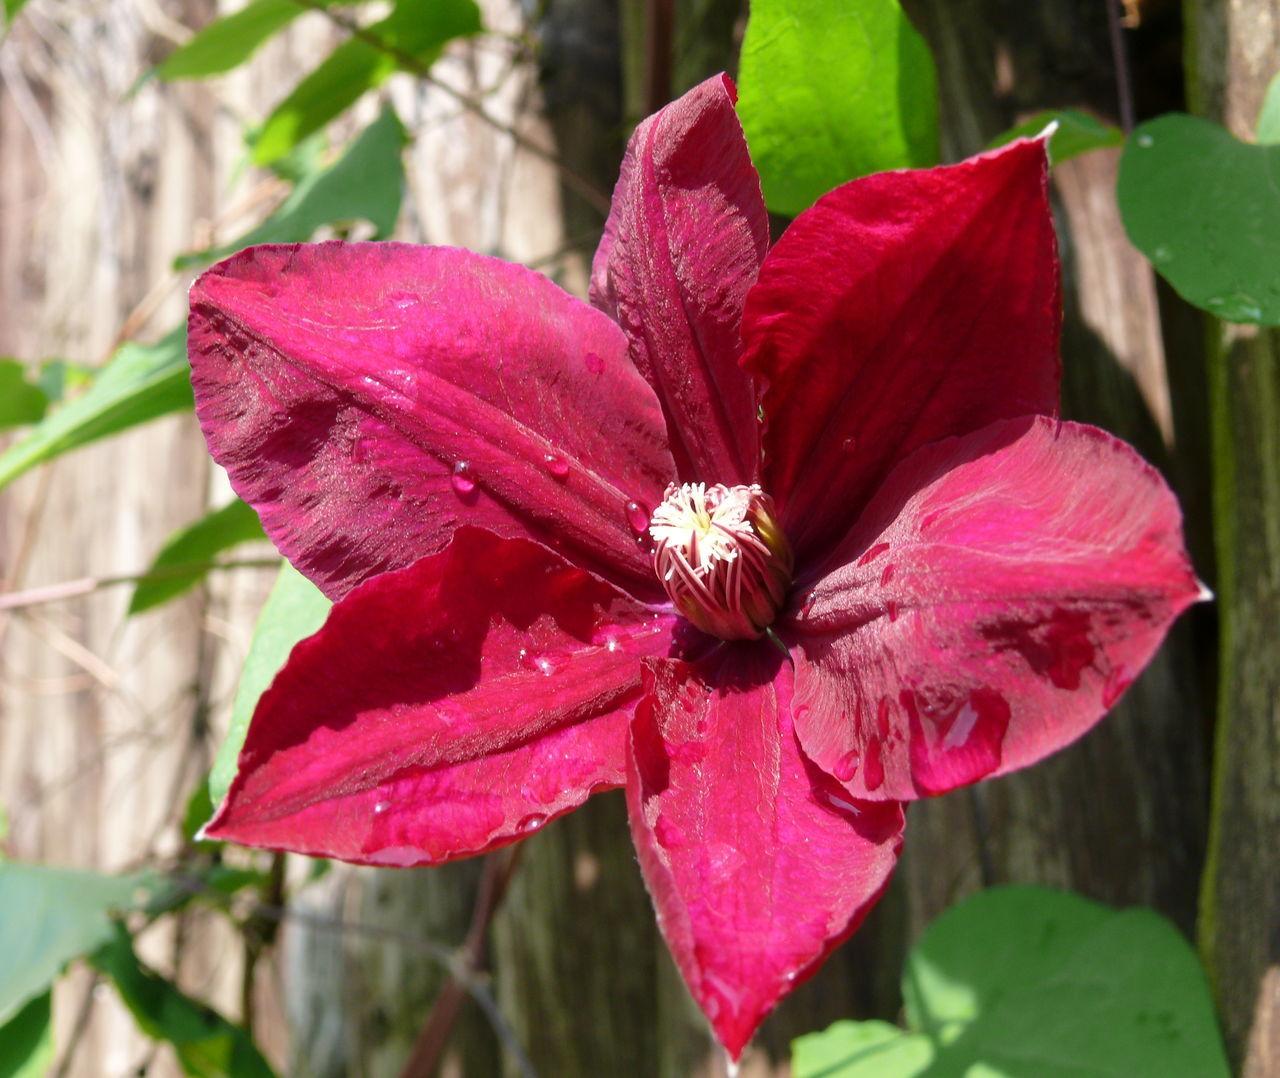 Clematis Clematis Flower Klematis Naturelovers Purple Flower Summerflowers Waldrebe WineRed